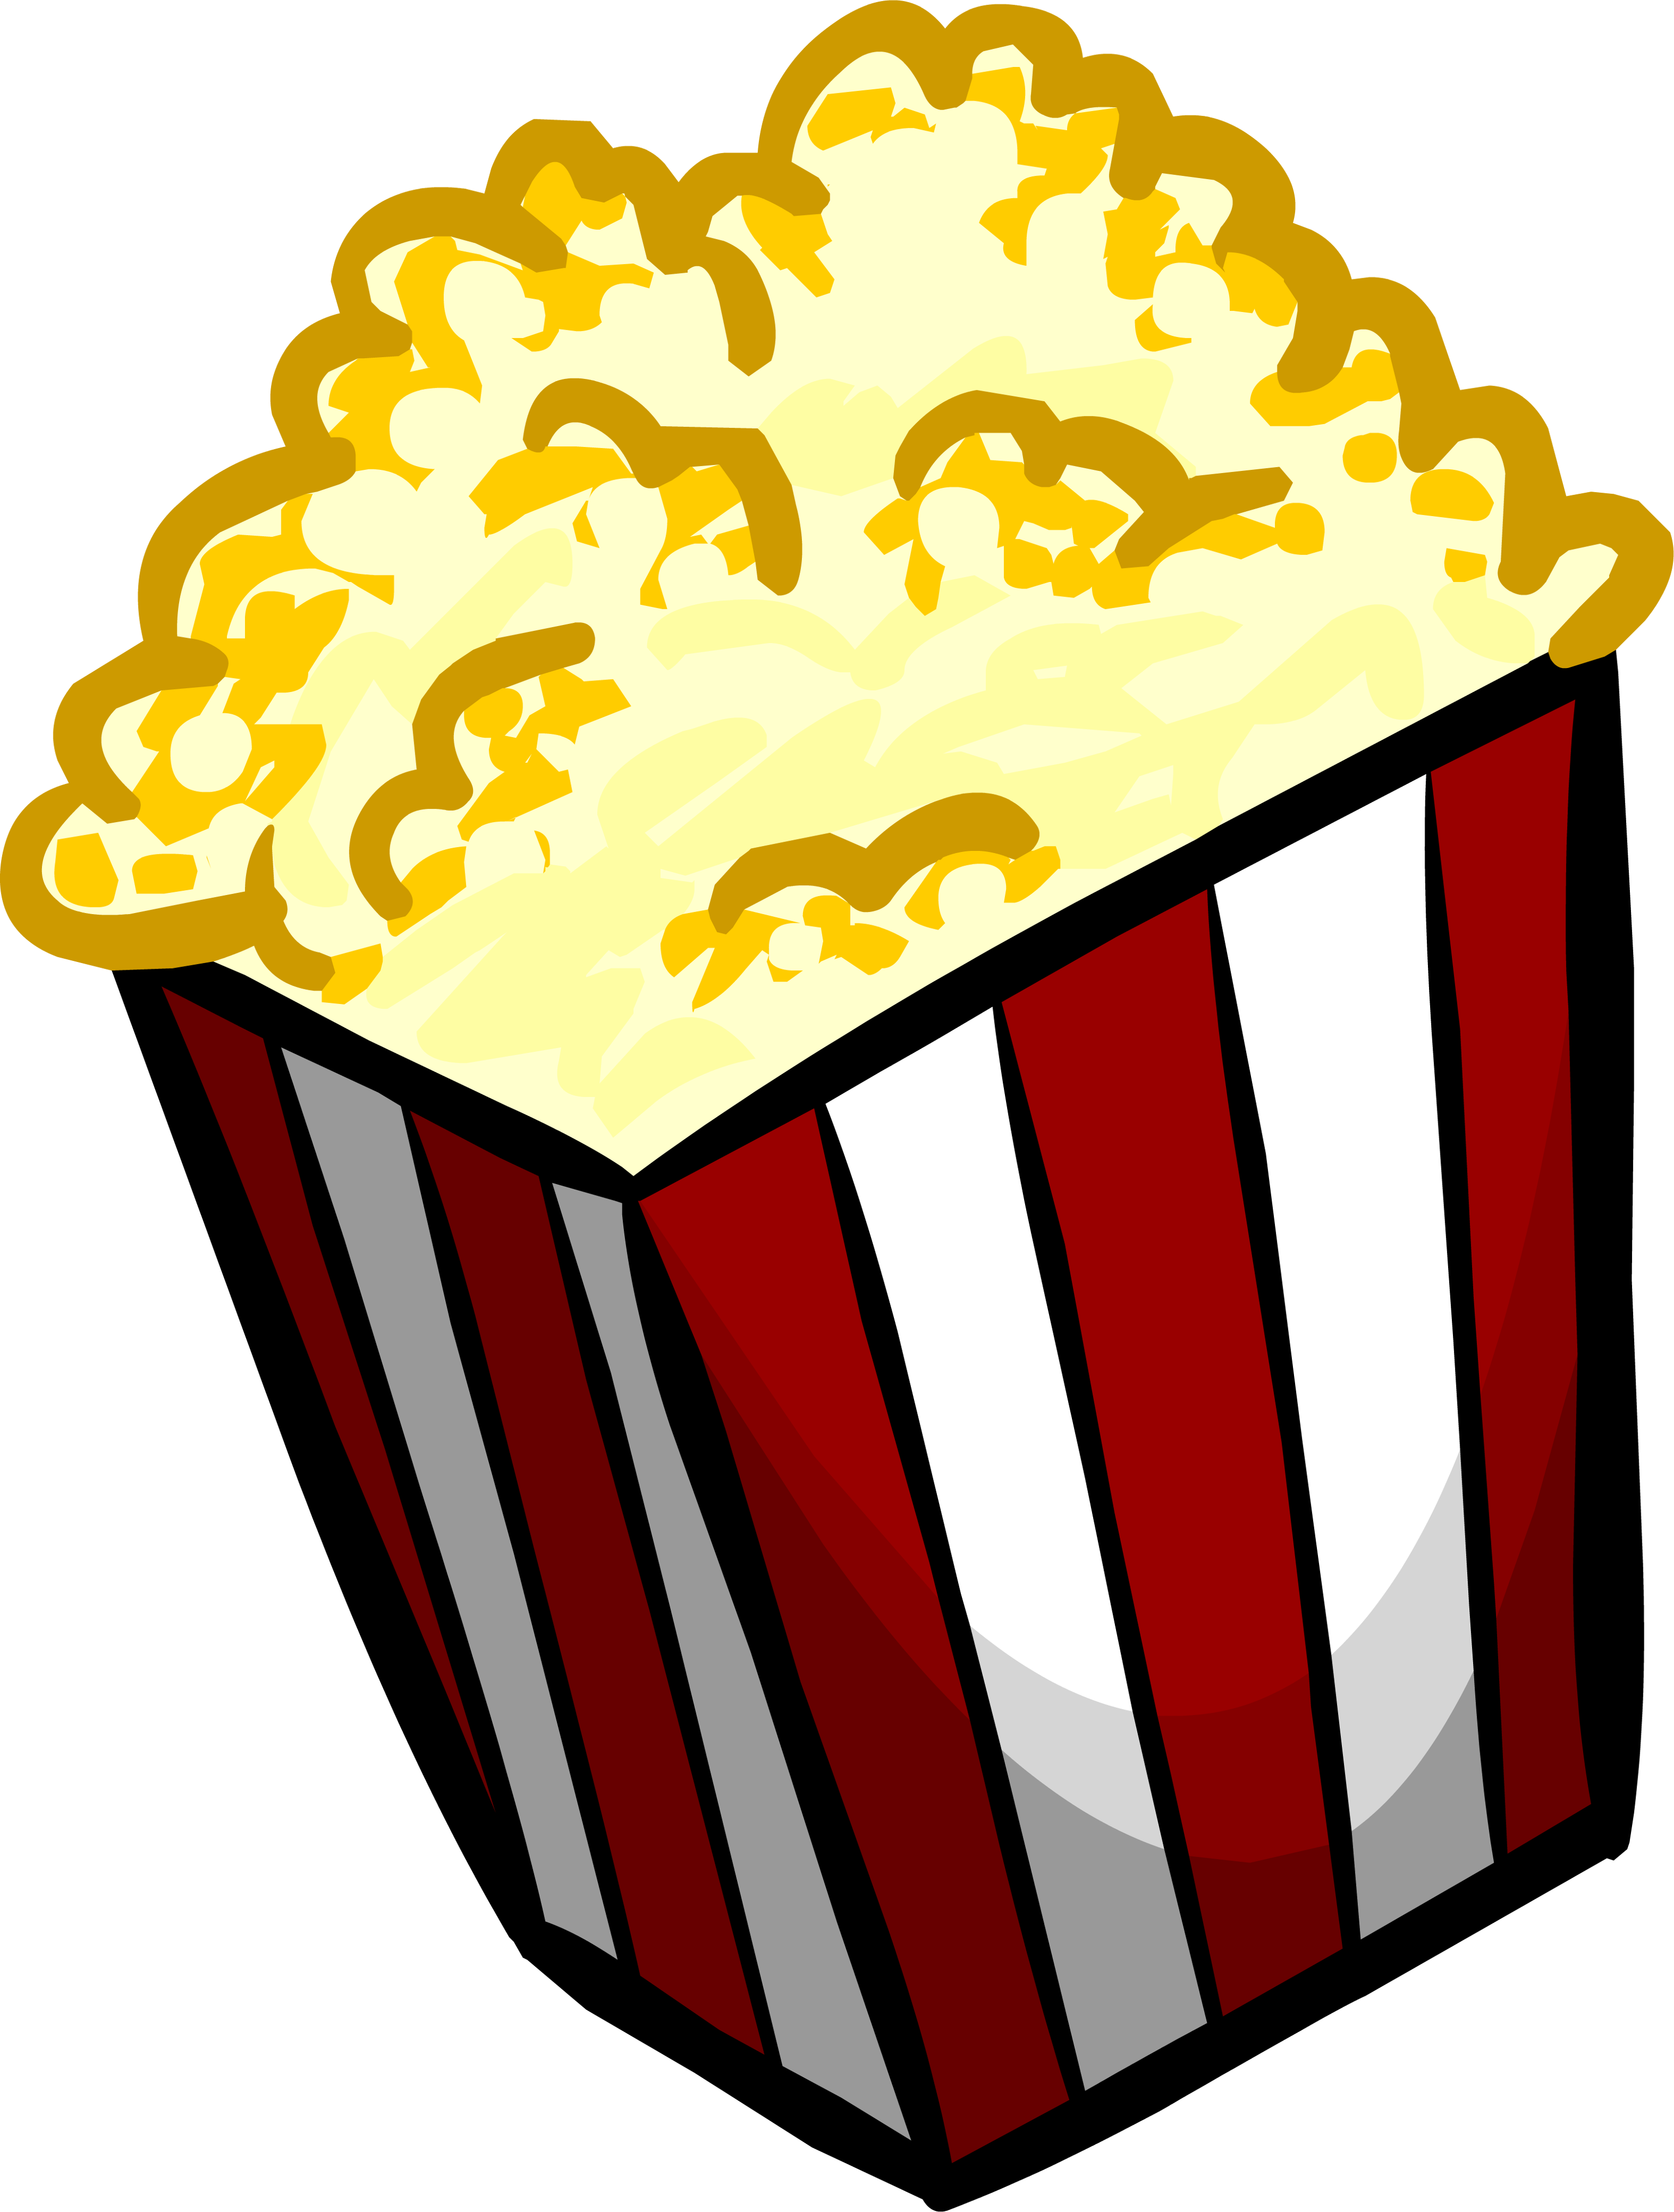 Clipart free popcorn. Download png transparent image